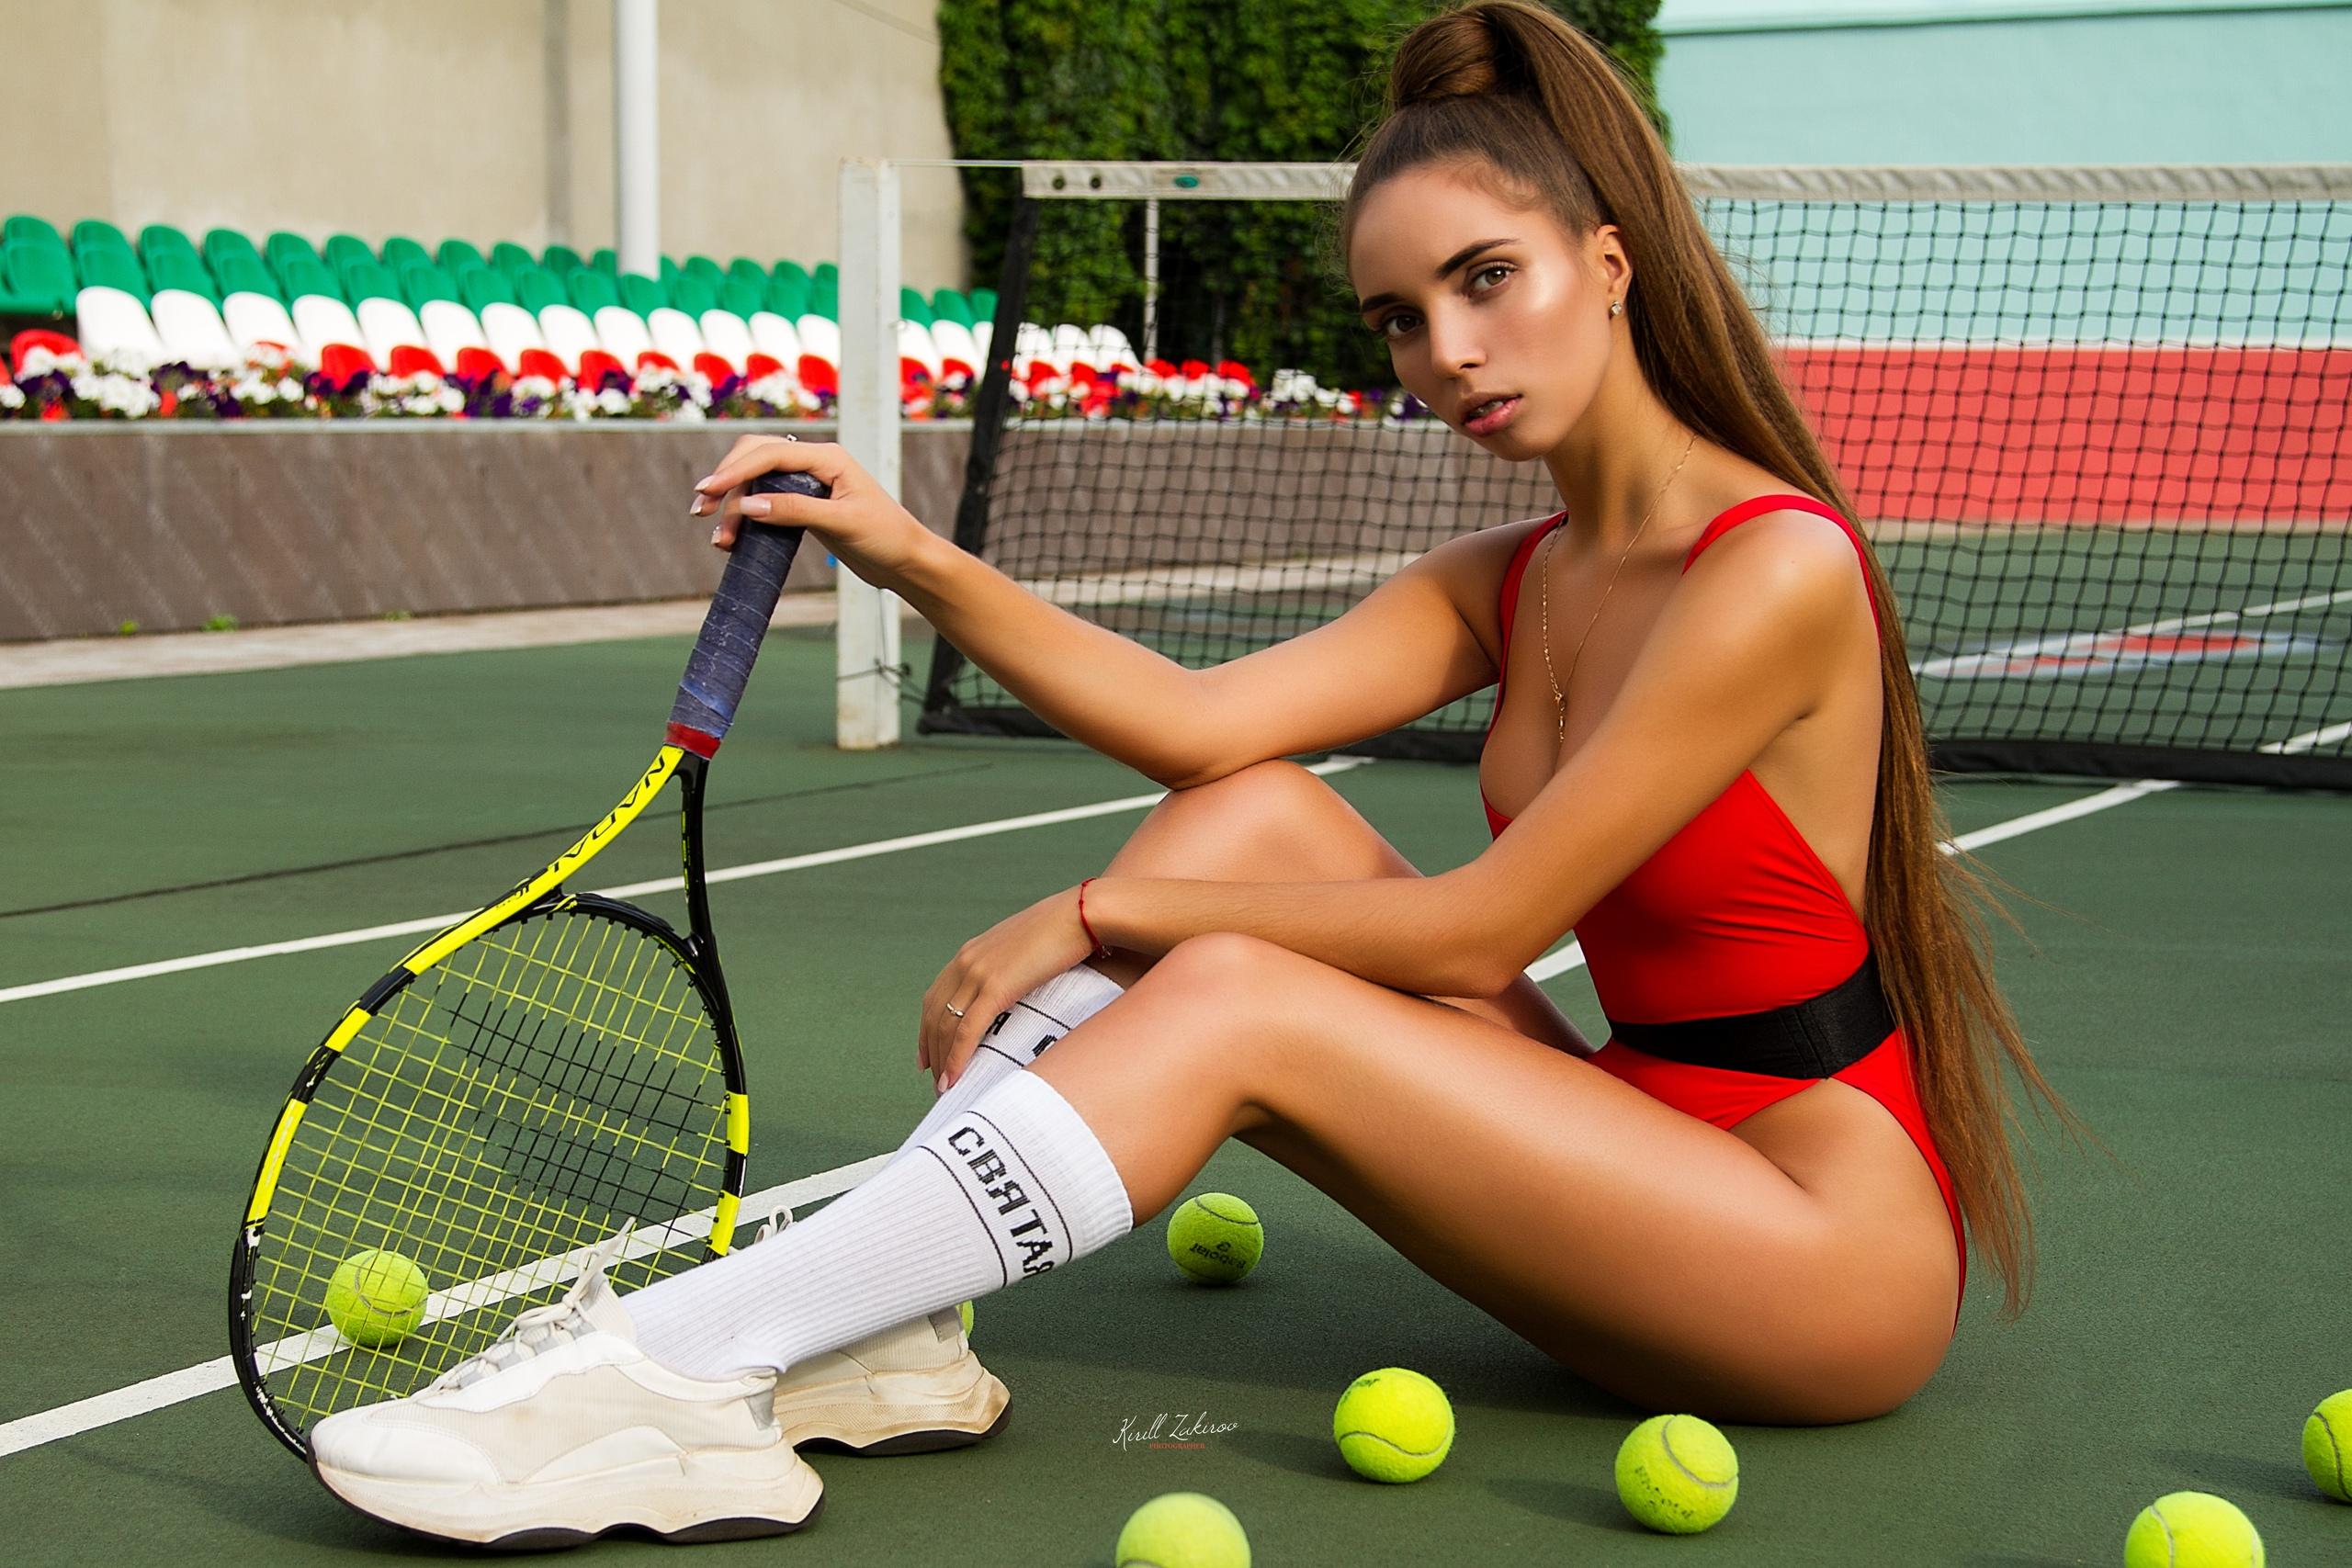 Wallpaper : women, Anna Vatslovna, tanned, tennis balls, tennis rackets,  long hair, sitting, white stockings, sneakers, braces, leotard, sportswear  2560x1707 - Motta123 - 1454709 - HD Wallpapers - WallHere